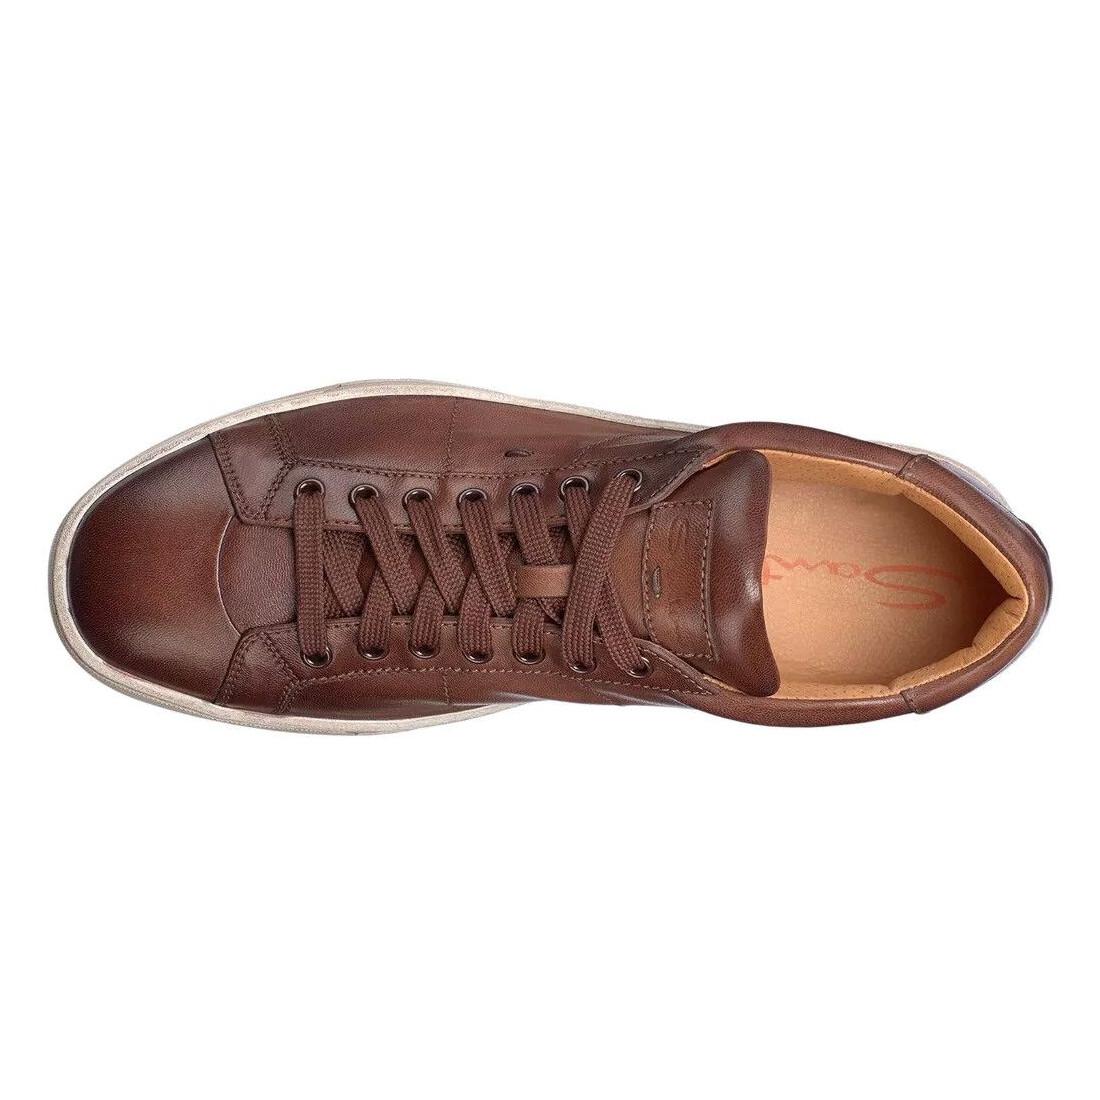 sneakers uomo santoni mbgl20850spomgoos50 7304